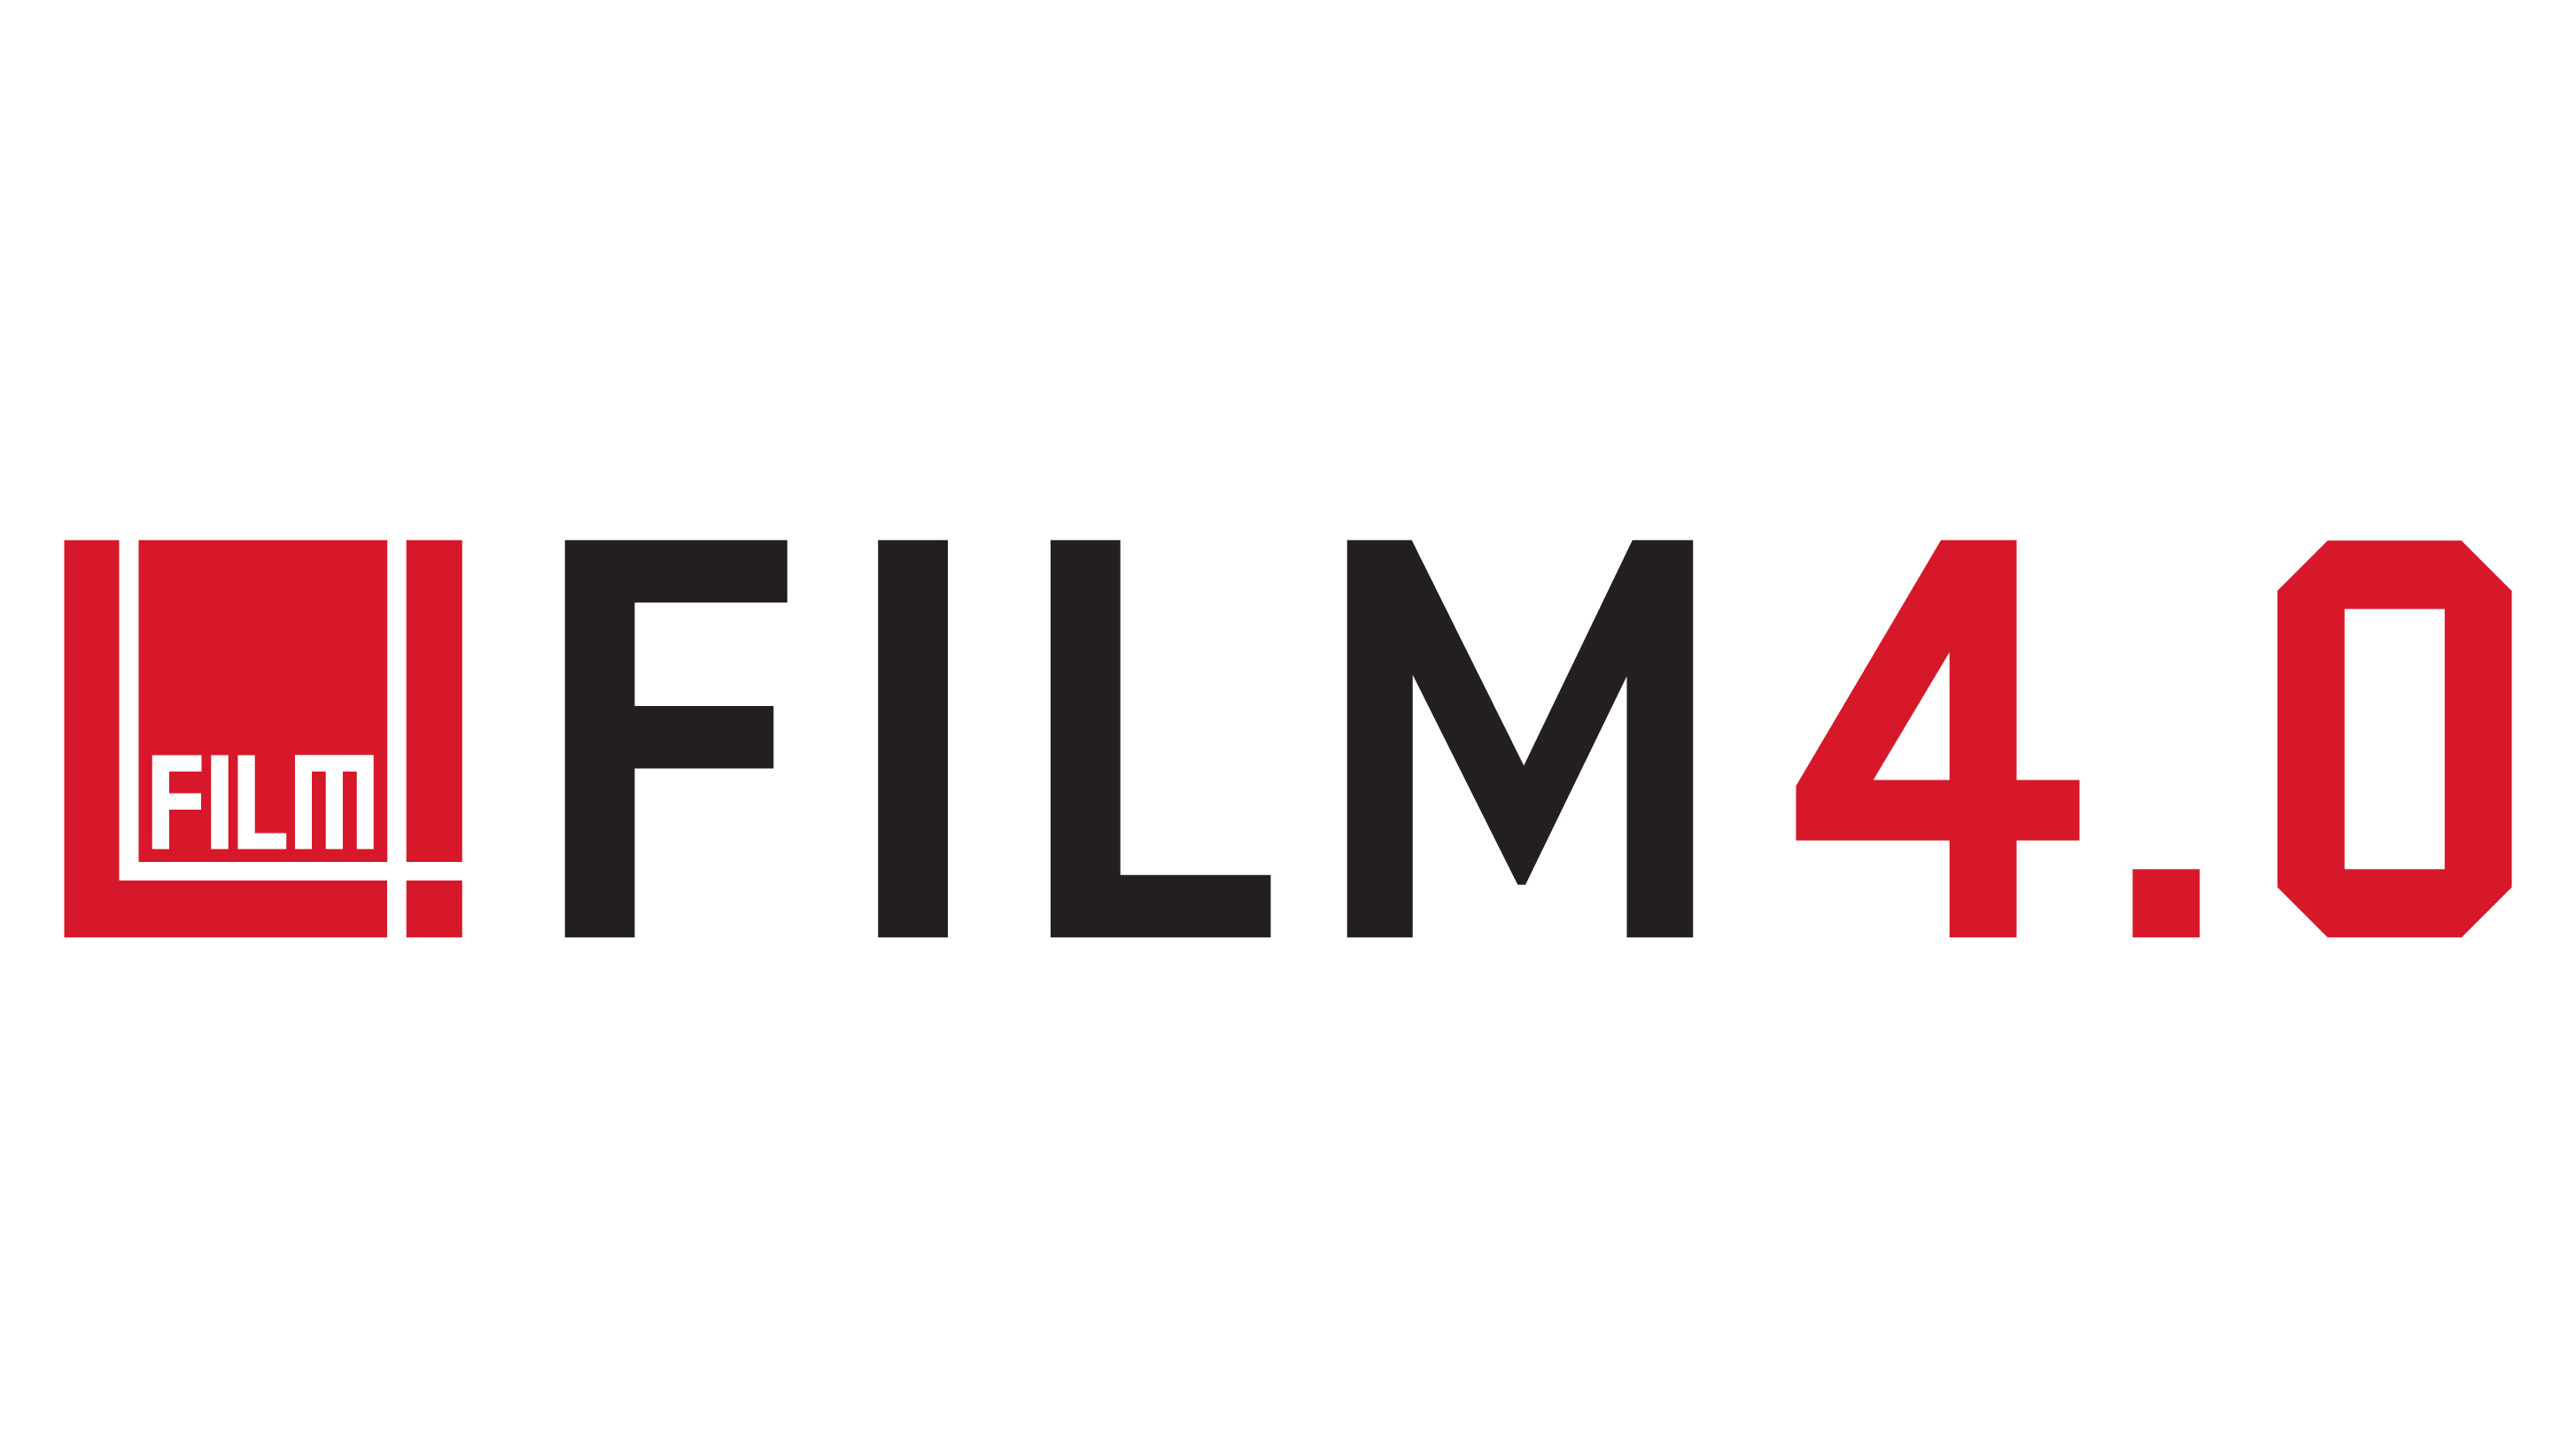 http://www.channel4.com/media/images/CorporatePortal/Benji/Logos/Film40.jpg